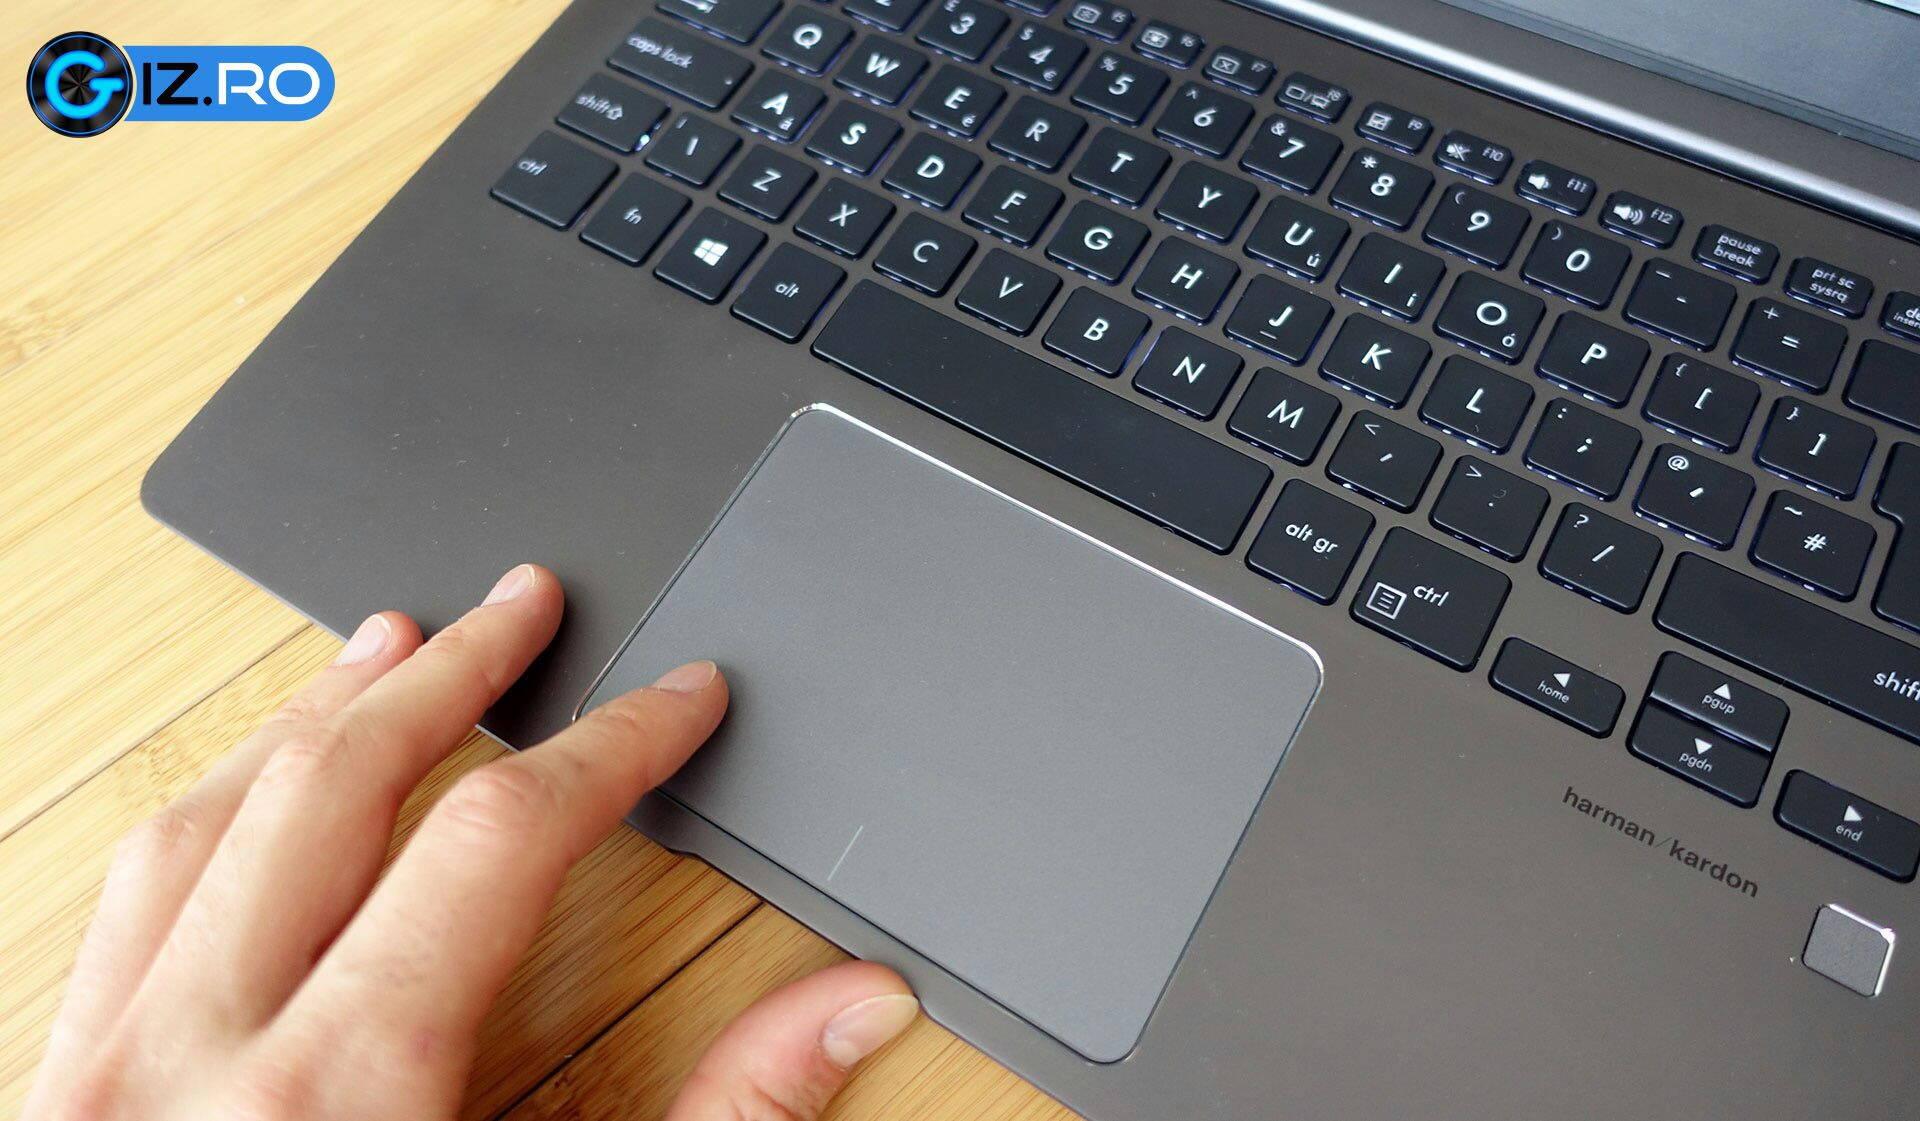 asus-zenbook-13-ux331-screen-trackpad